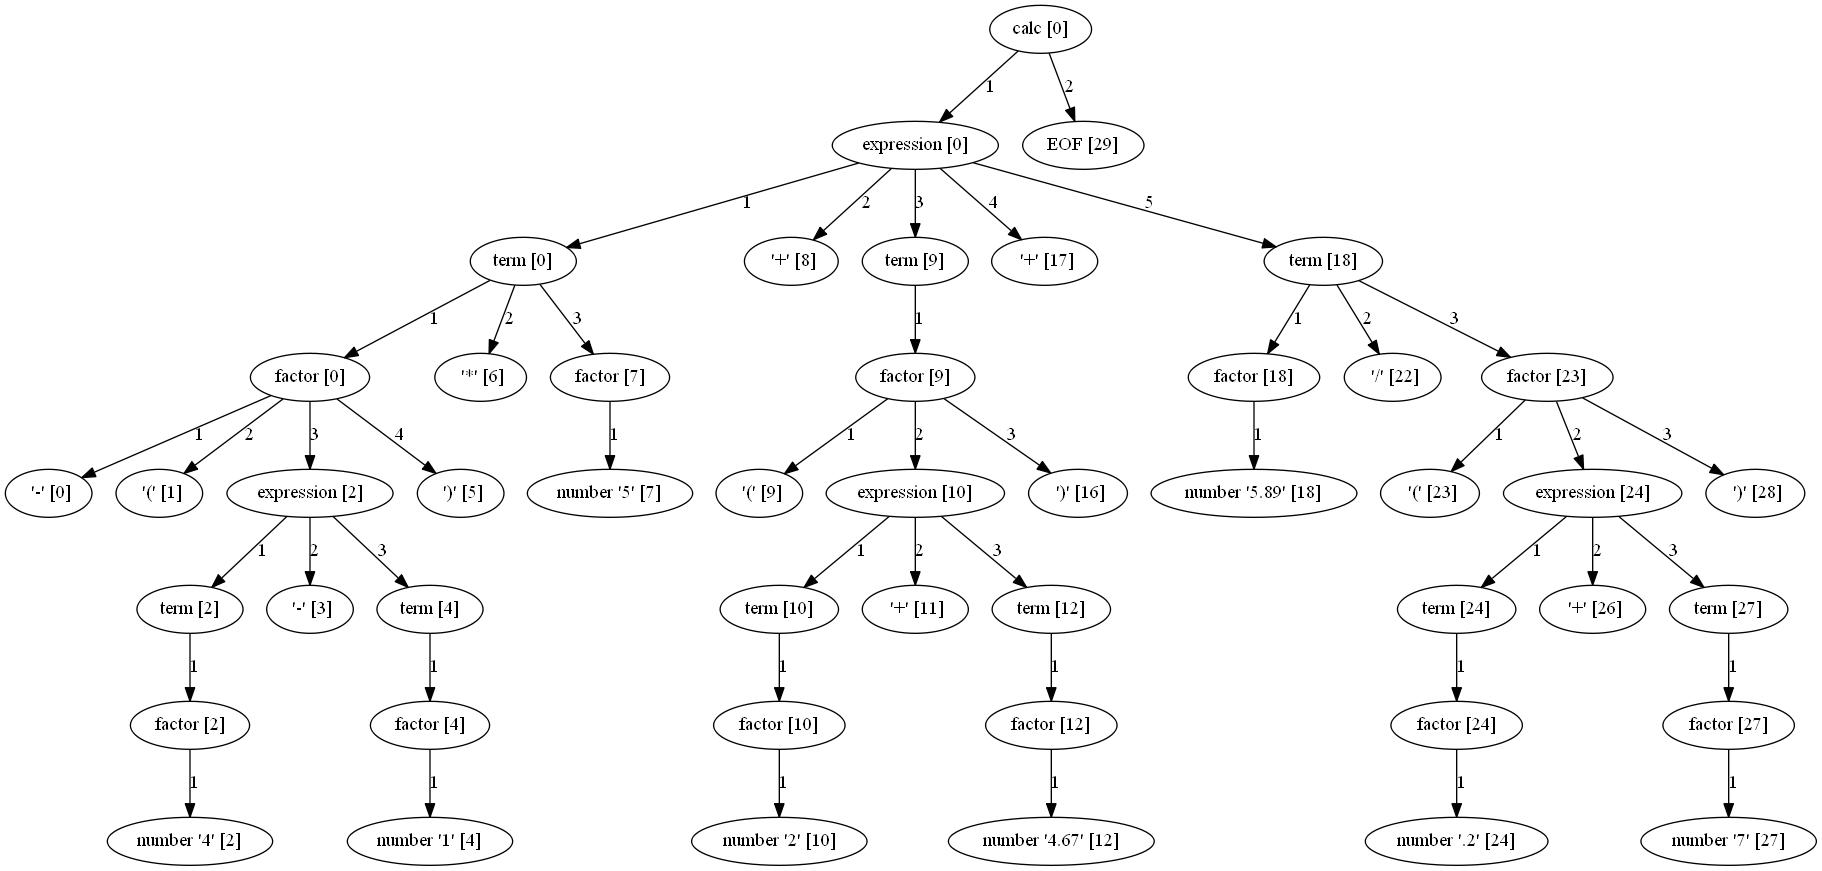 calc_parse_tree.dot